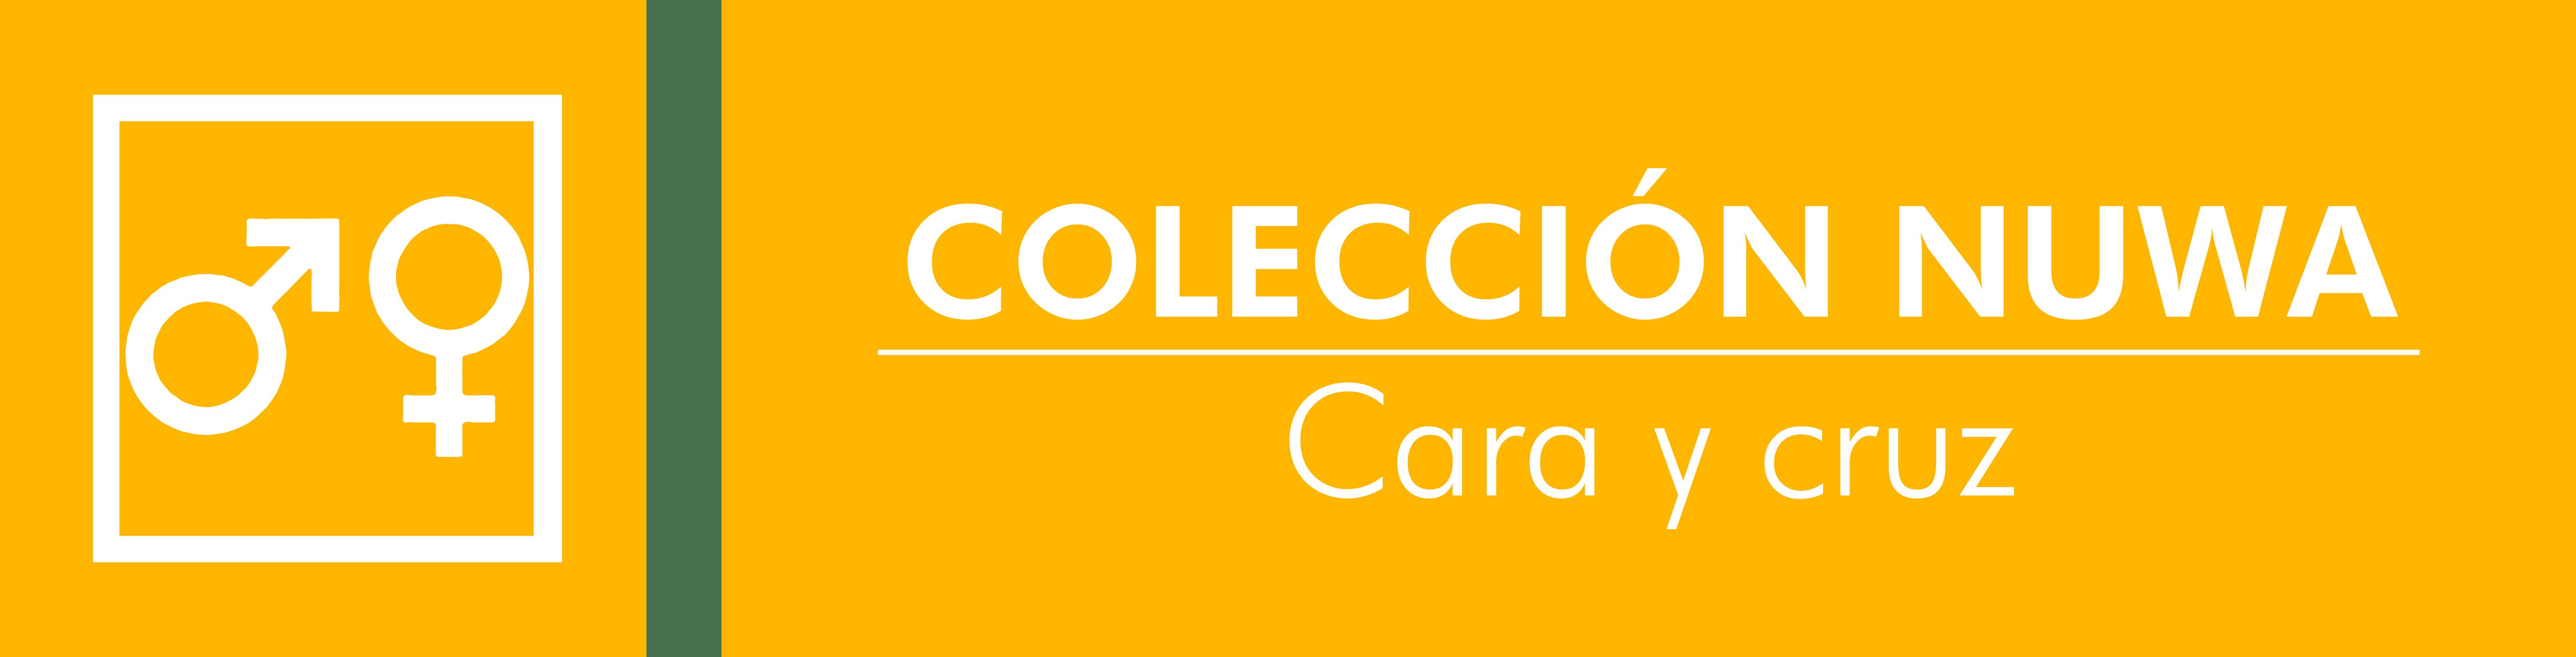 CC-16